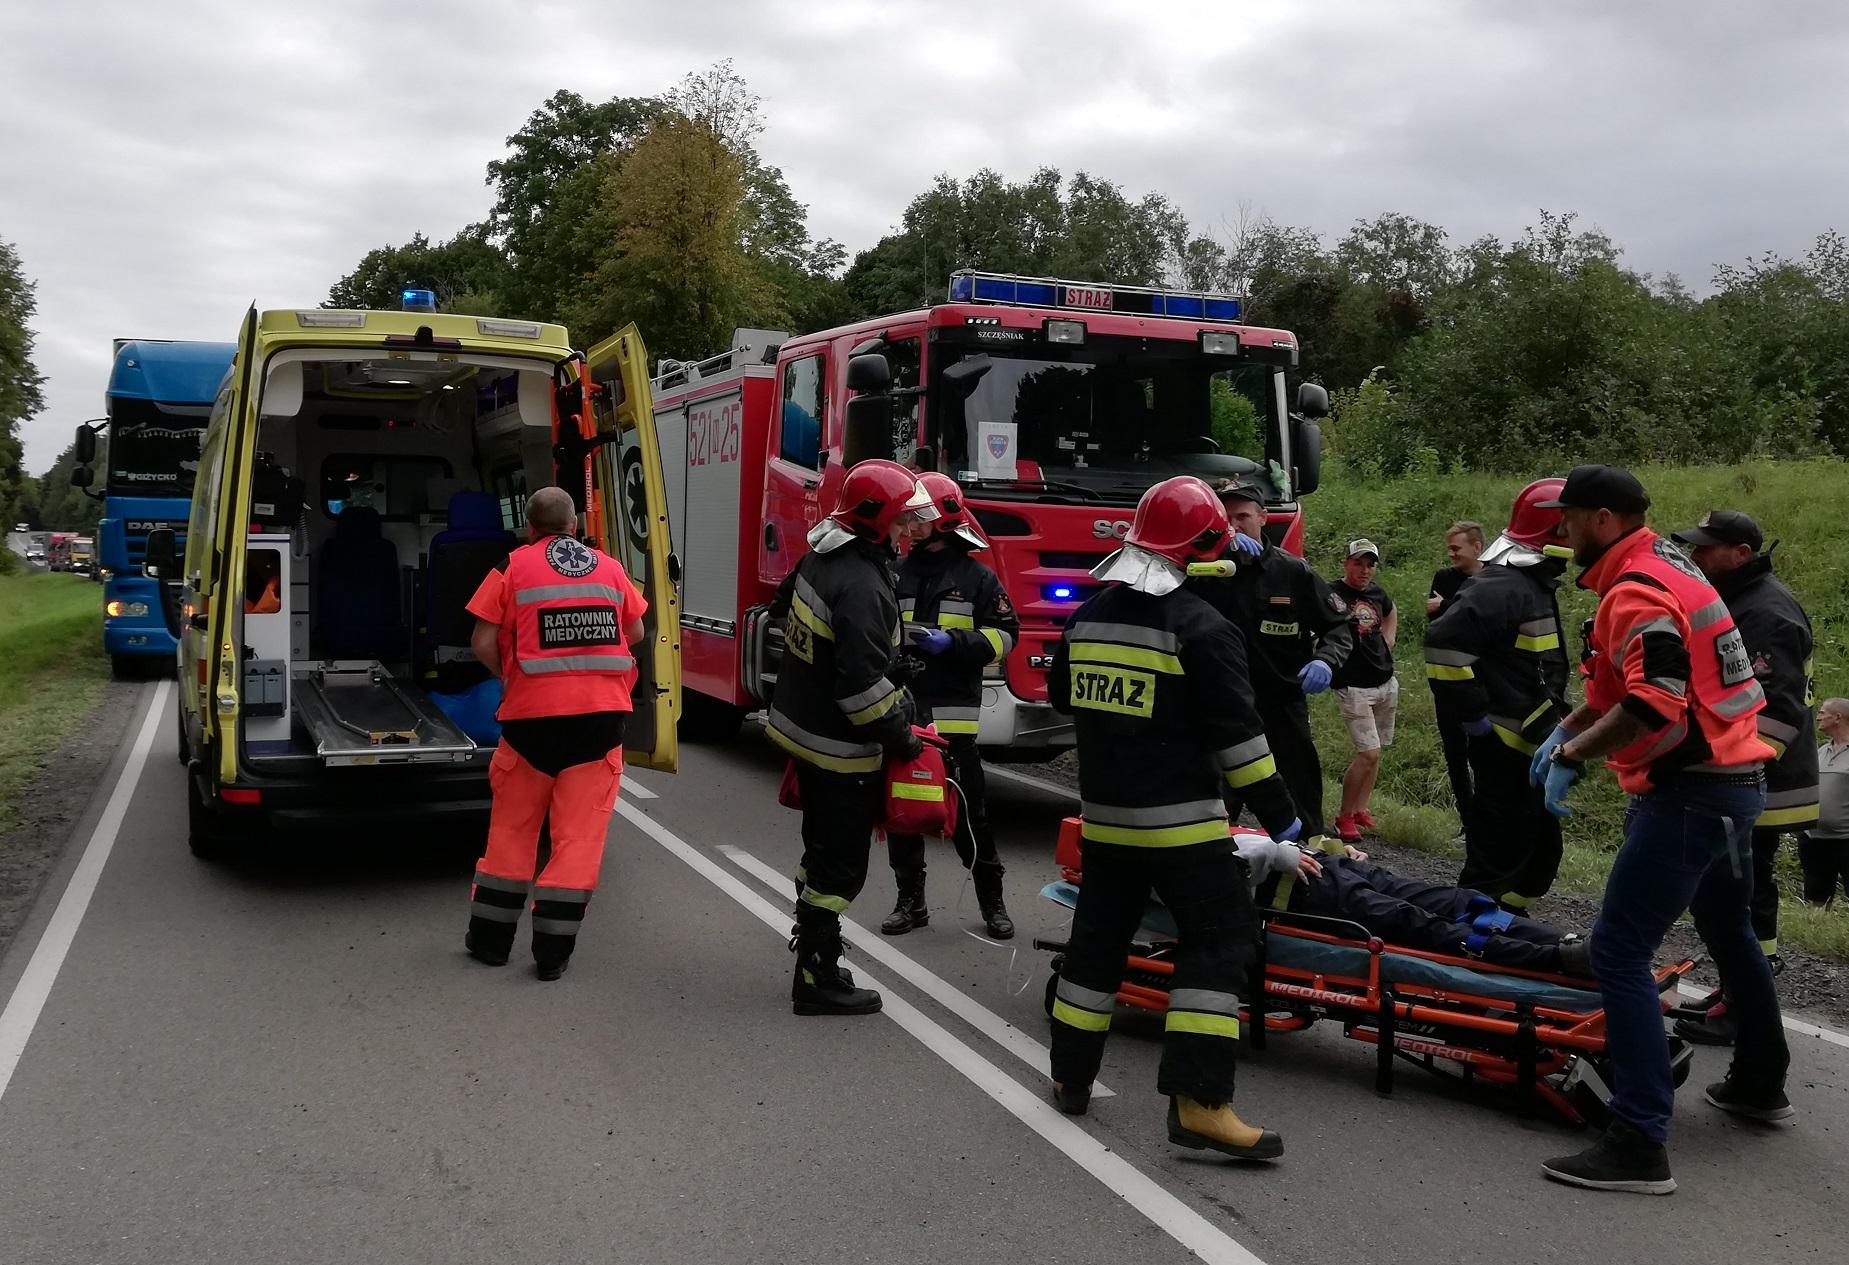 http://m.wm.pl/2018/09/orig/0000063984-wypadek-przytuly-14-09-18c-494109.jpg